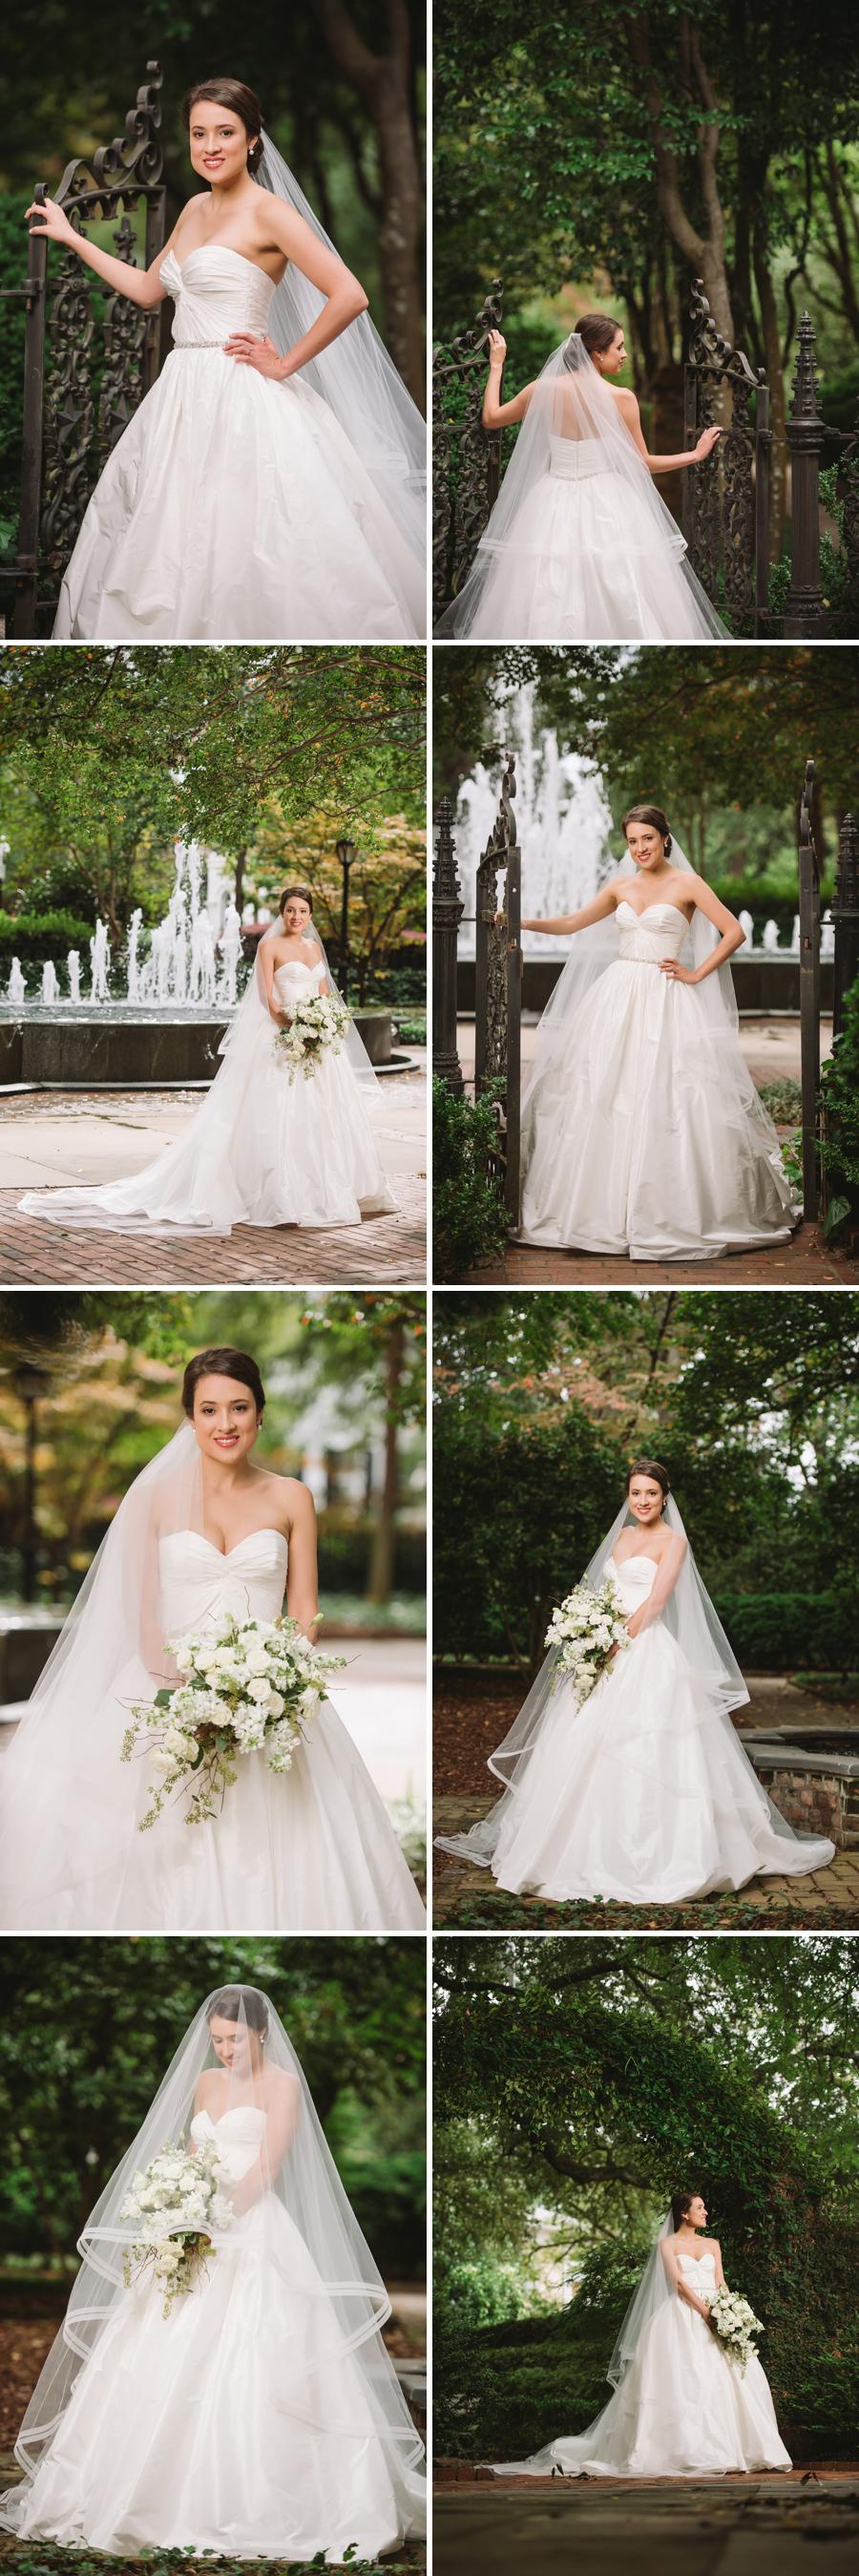 Caitlin bridal portrait sc lace house for Wedding dresses in columbia sc